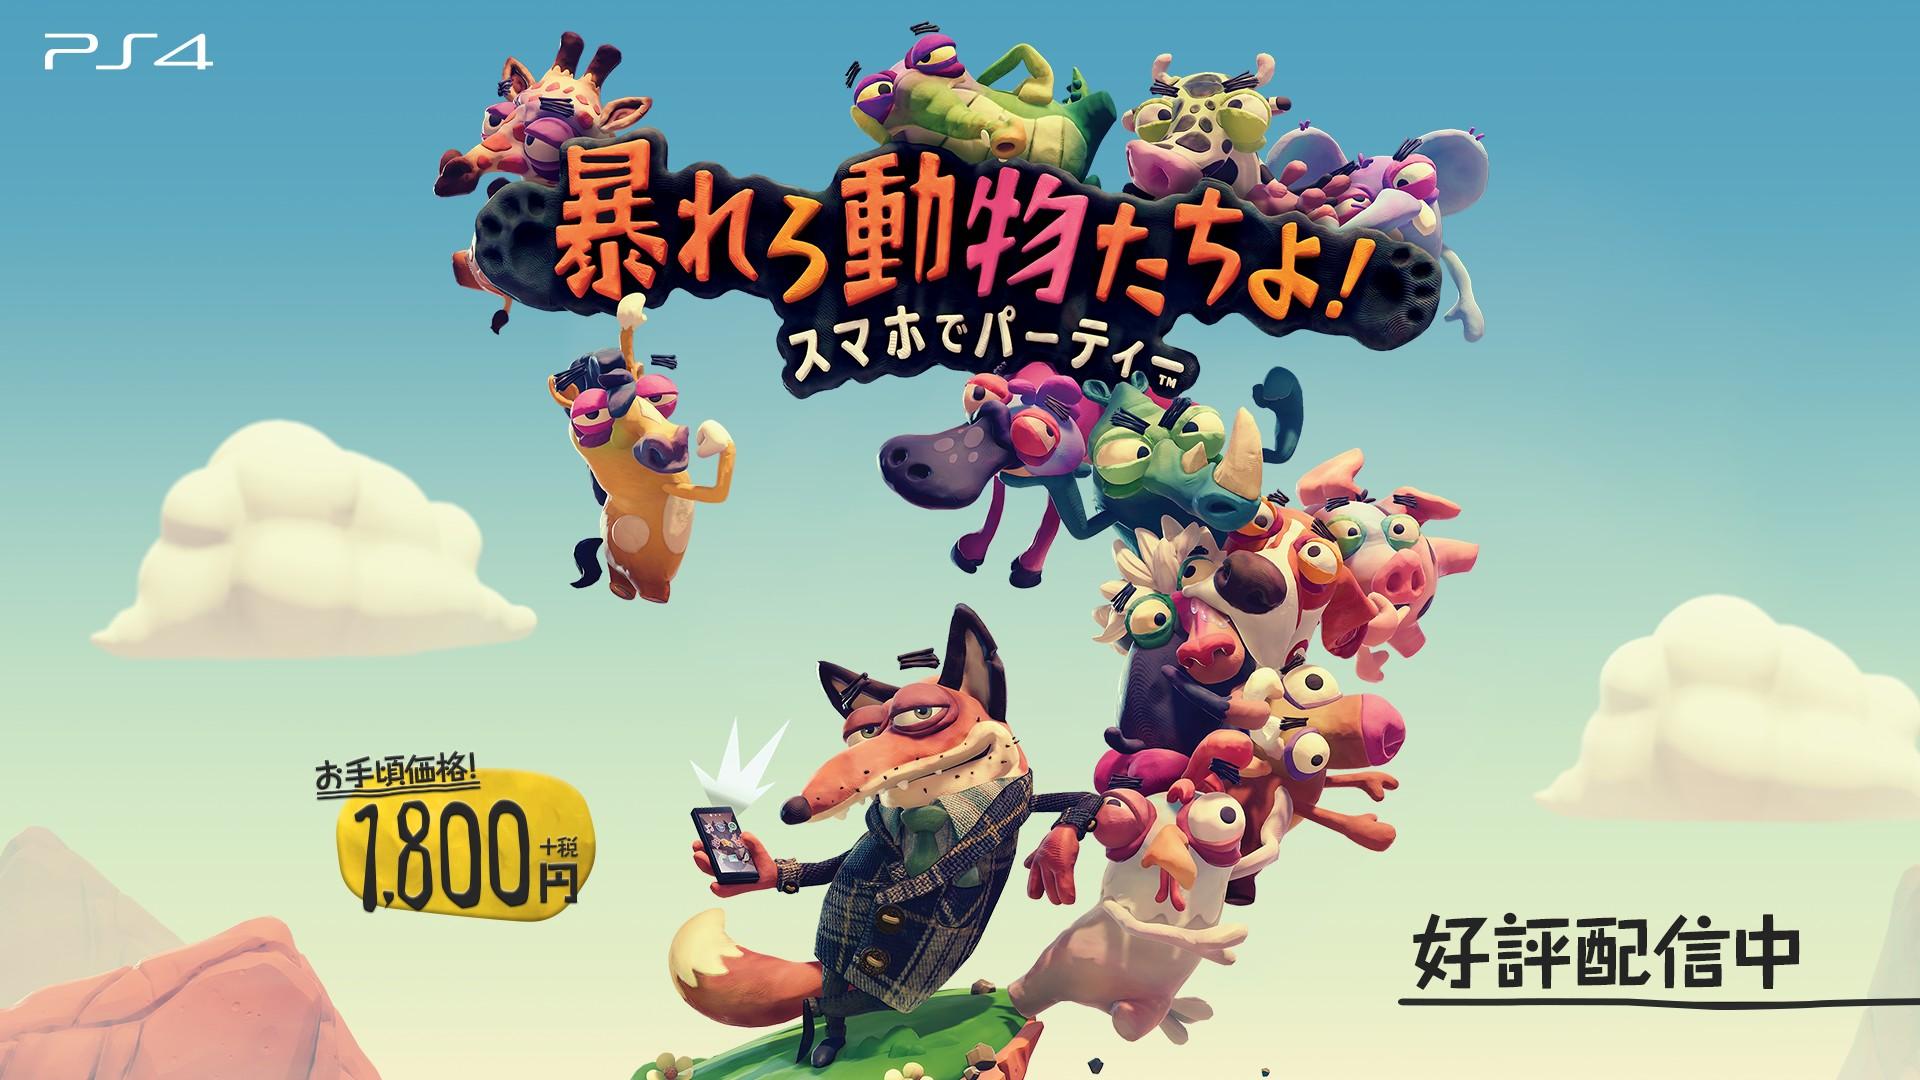 PlayStation®4『暴れろ 動物たちよ! スマホでパーティー』 お手頃価格 1,800円(税別)で好評配信中